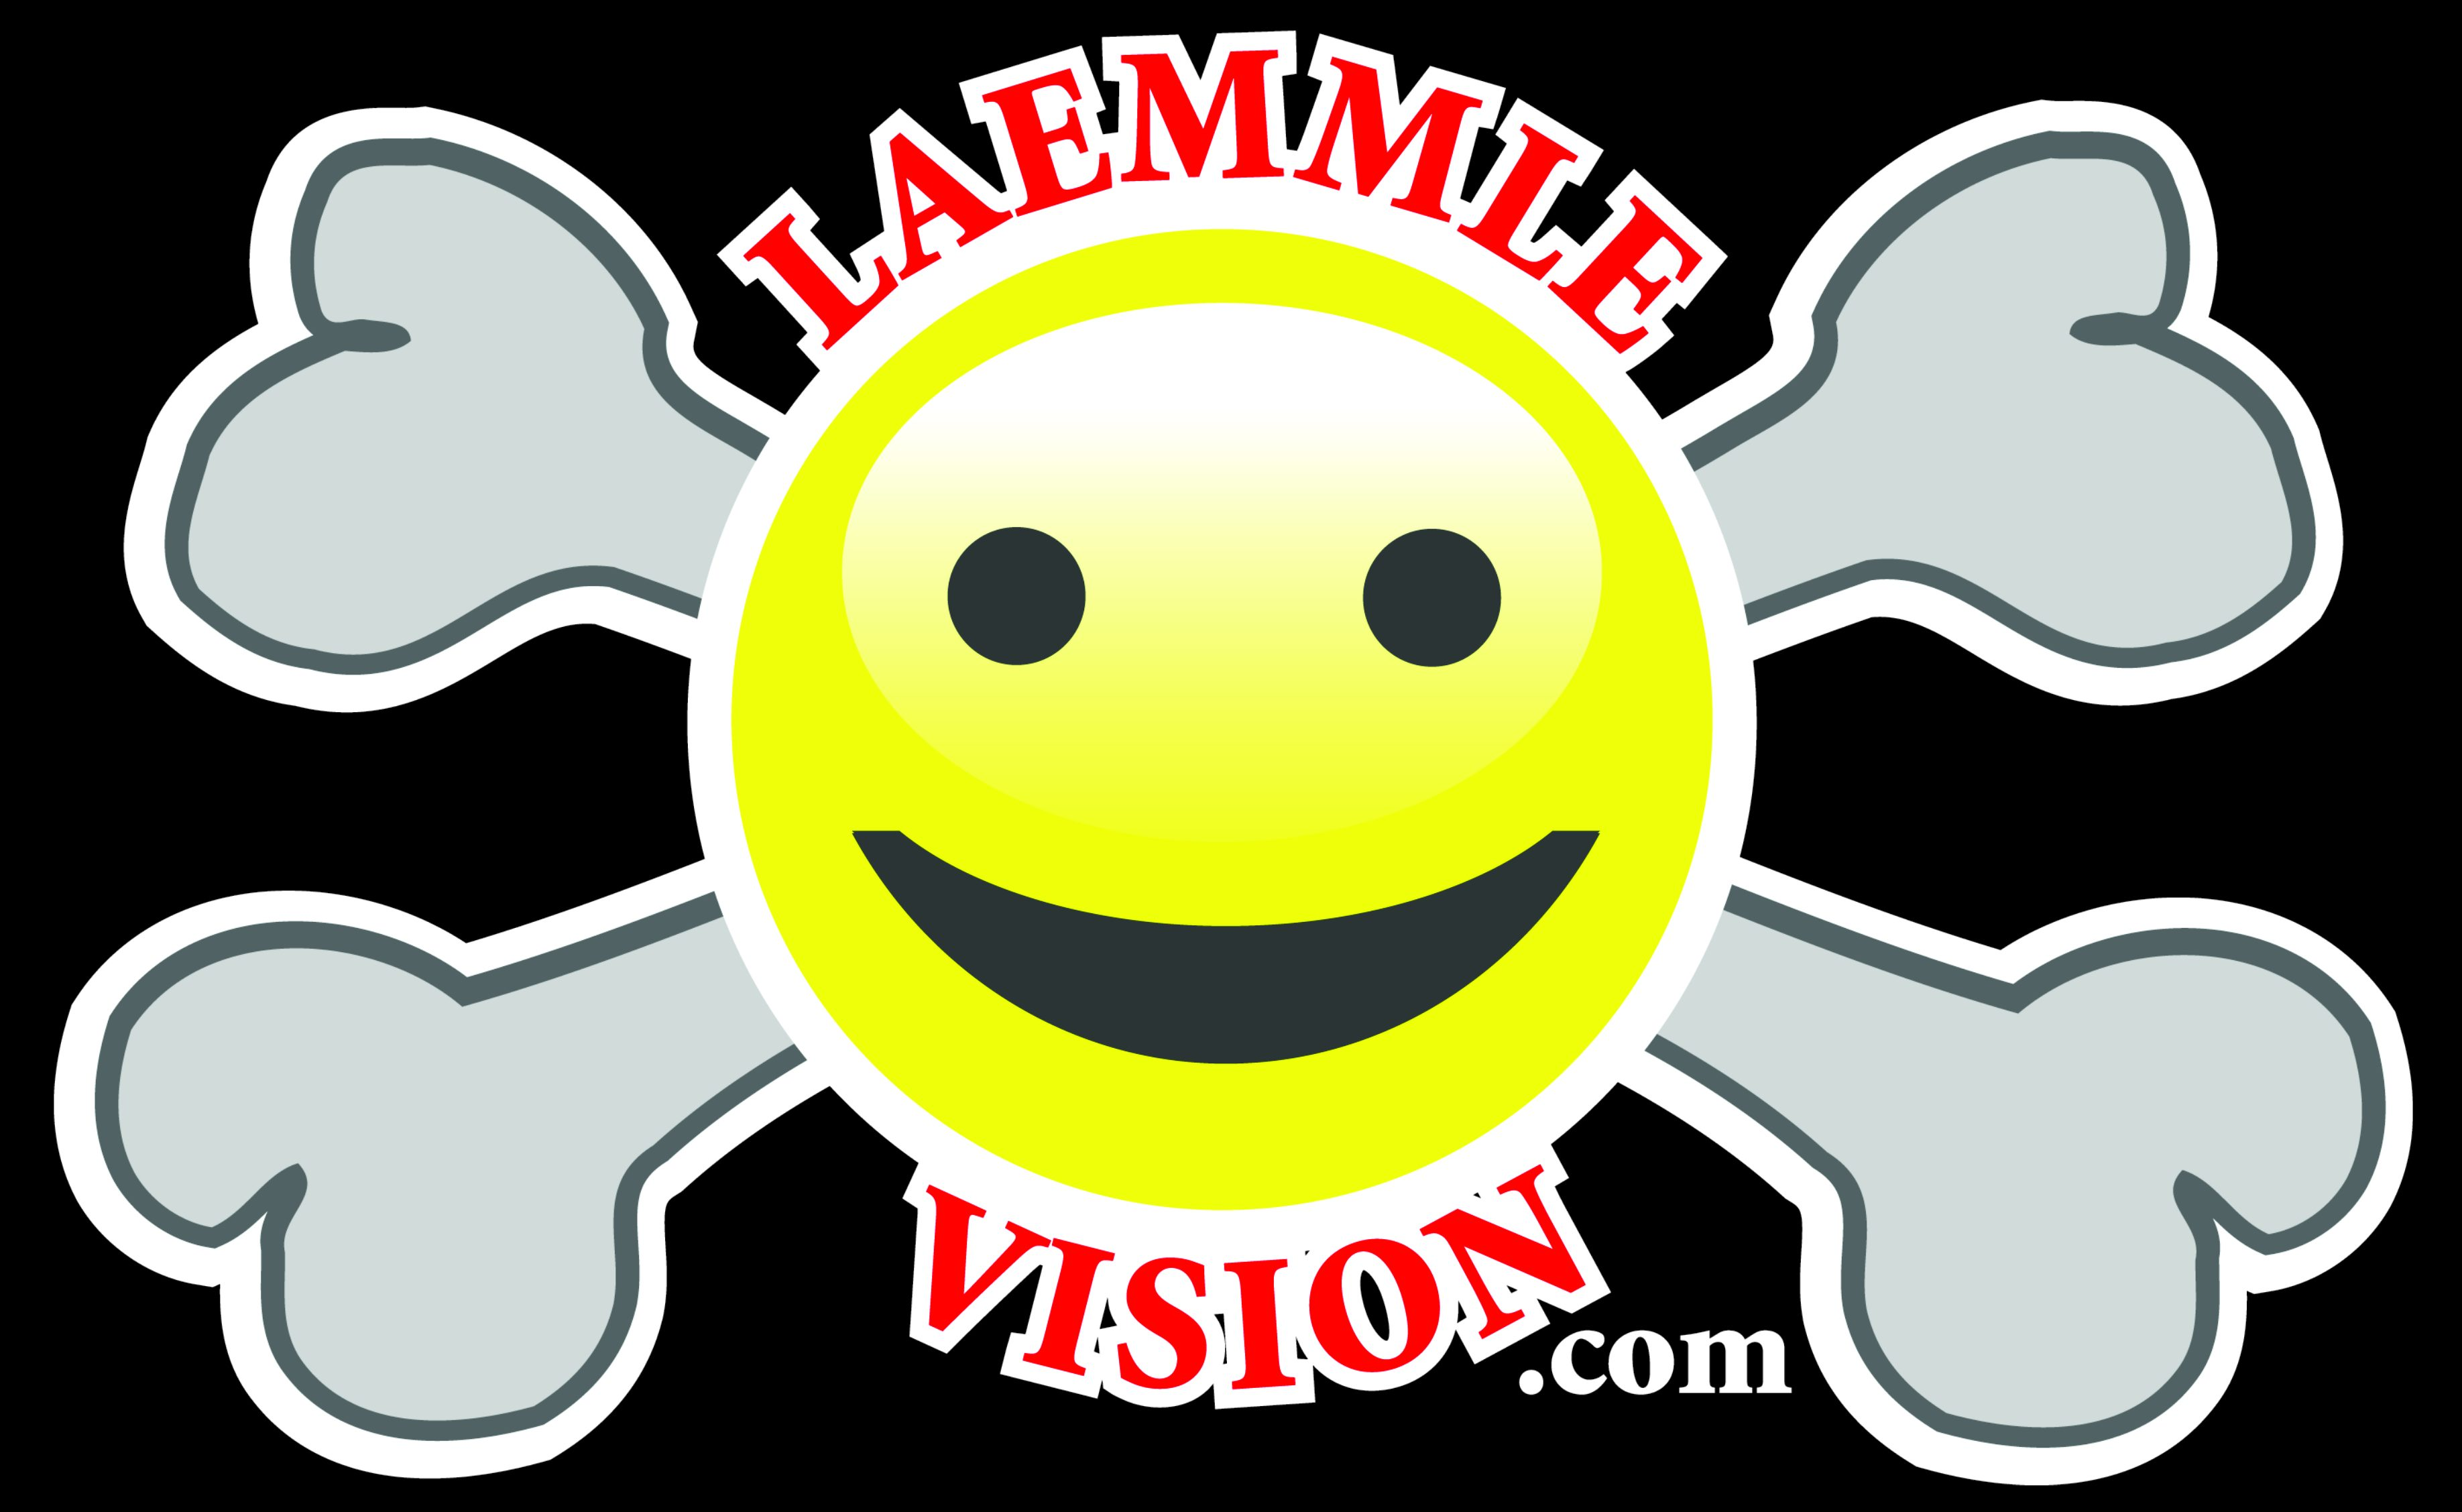 Laemmle-Vision